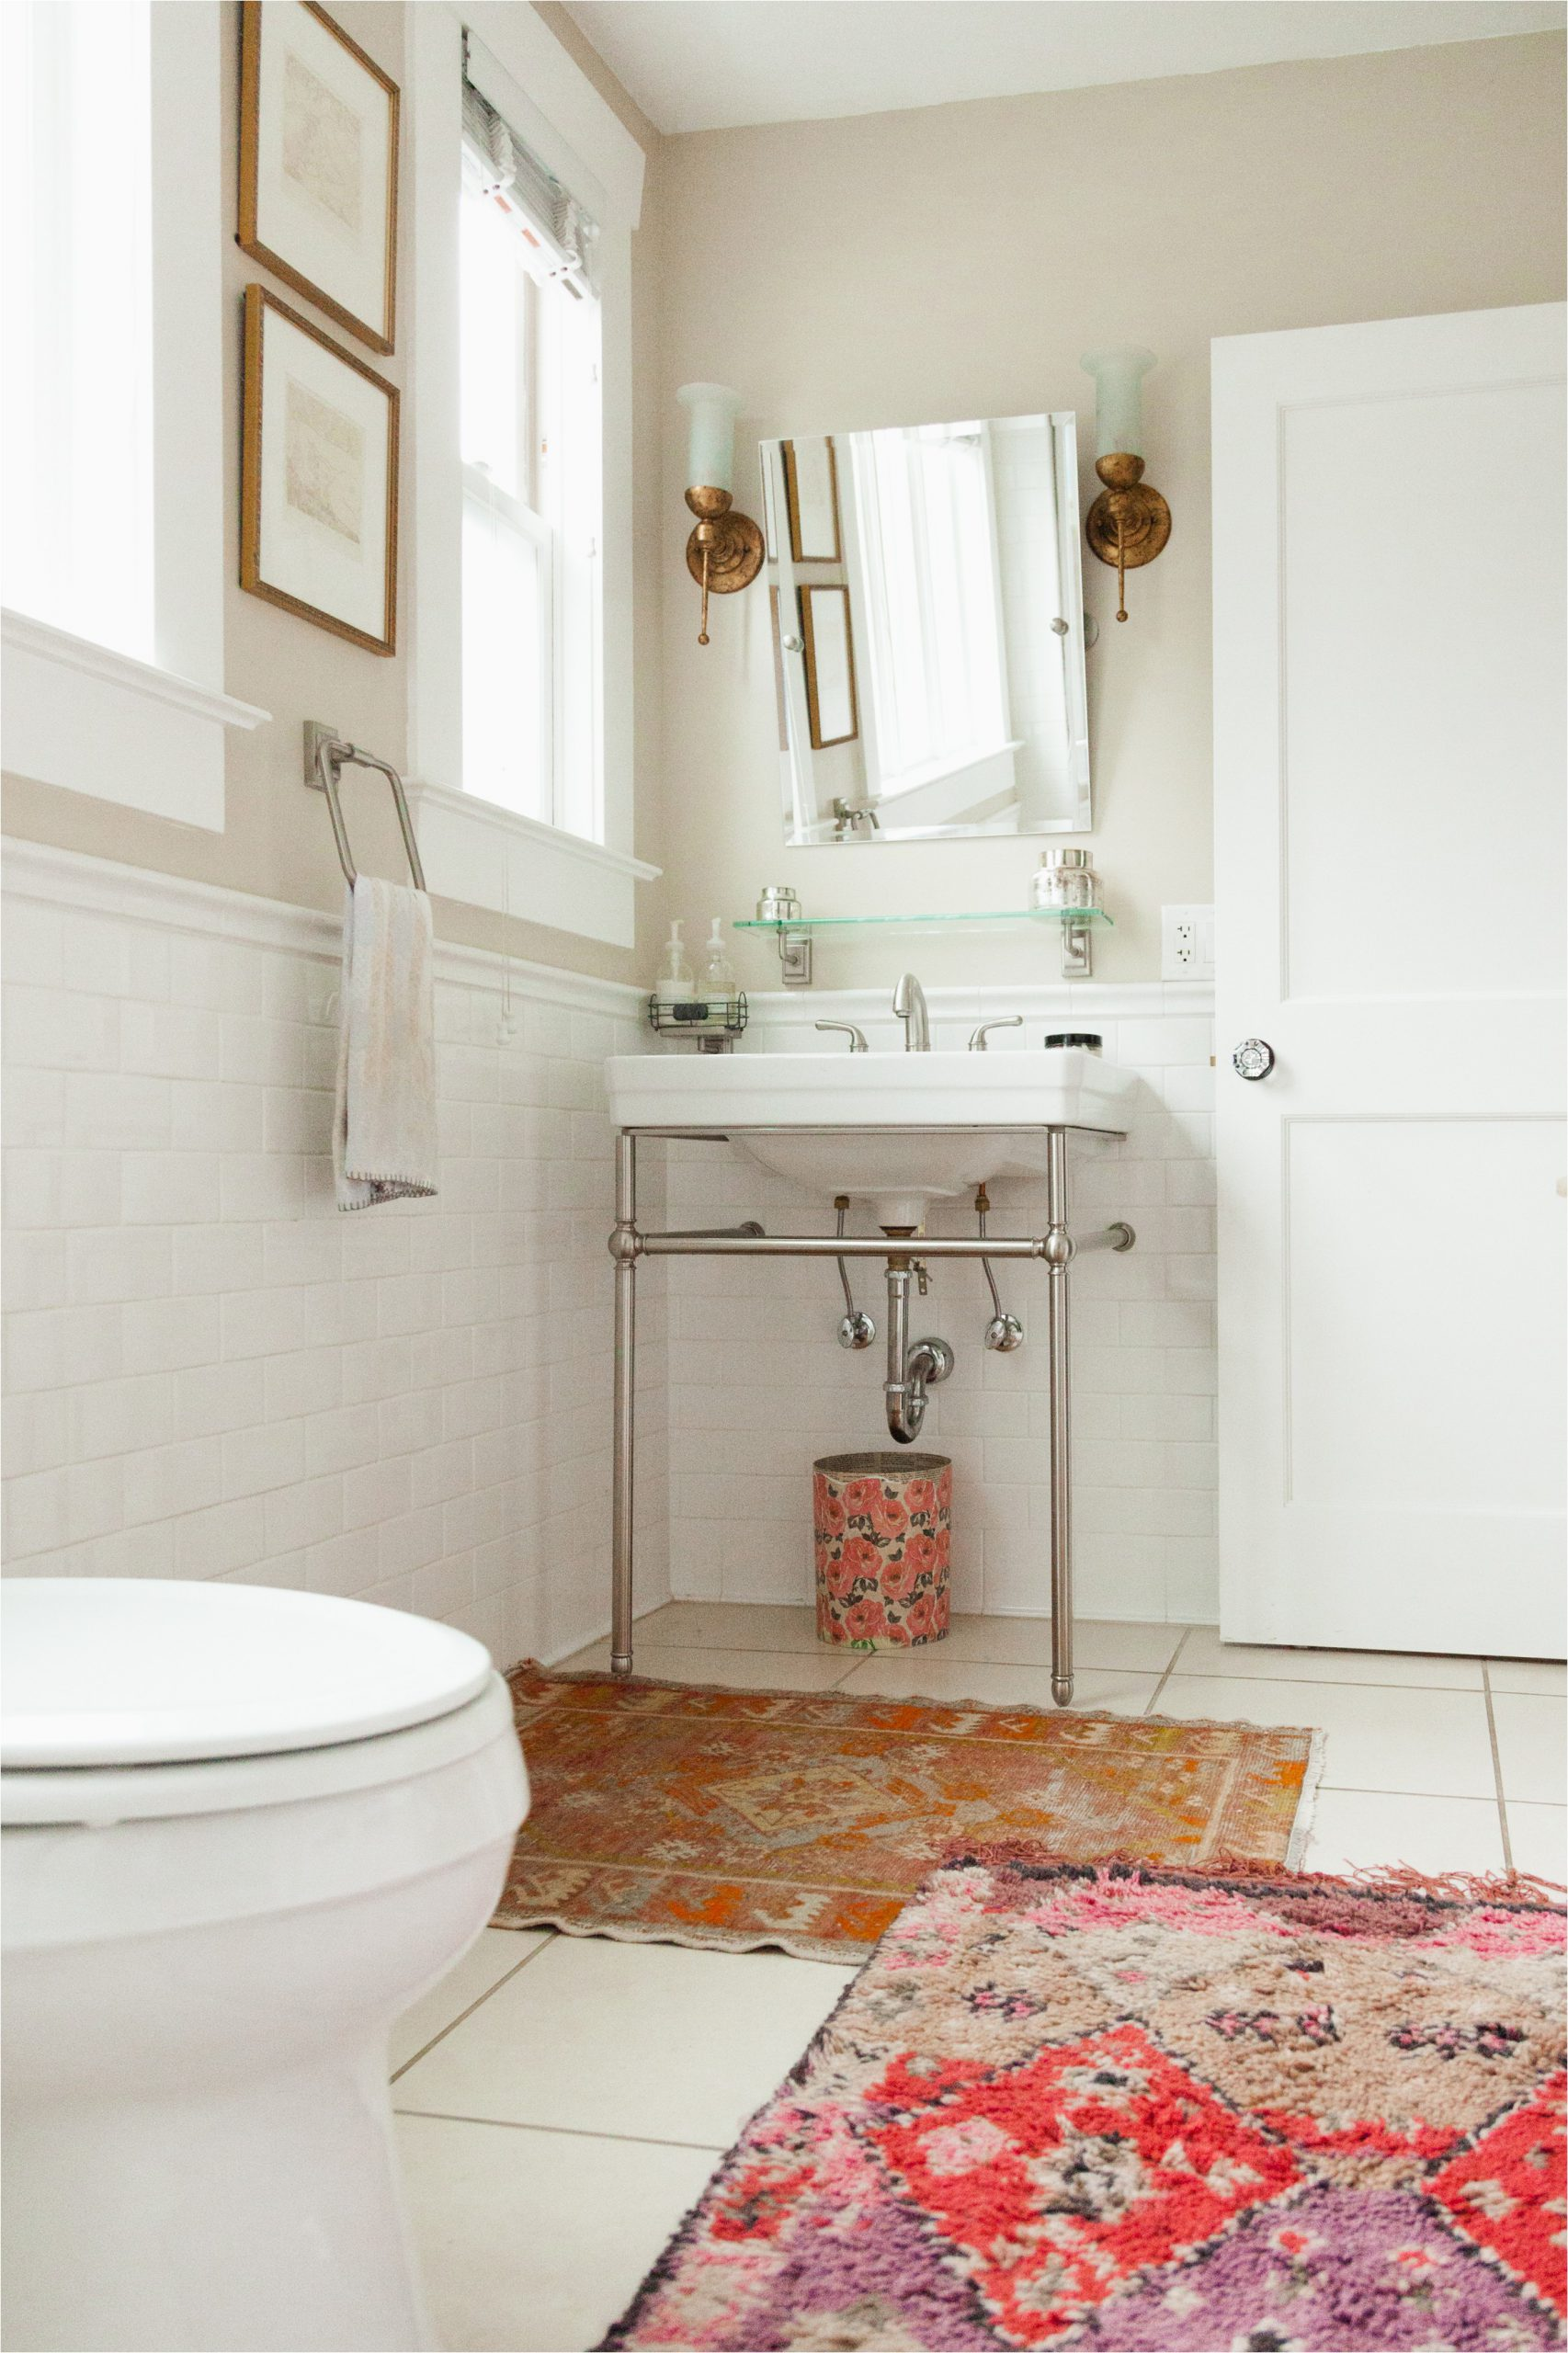 Best area Rugs for Bathrooms Look We Love Using Real Rugs In the Bathroom